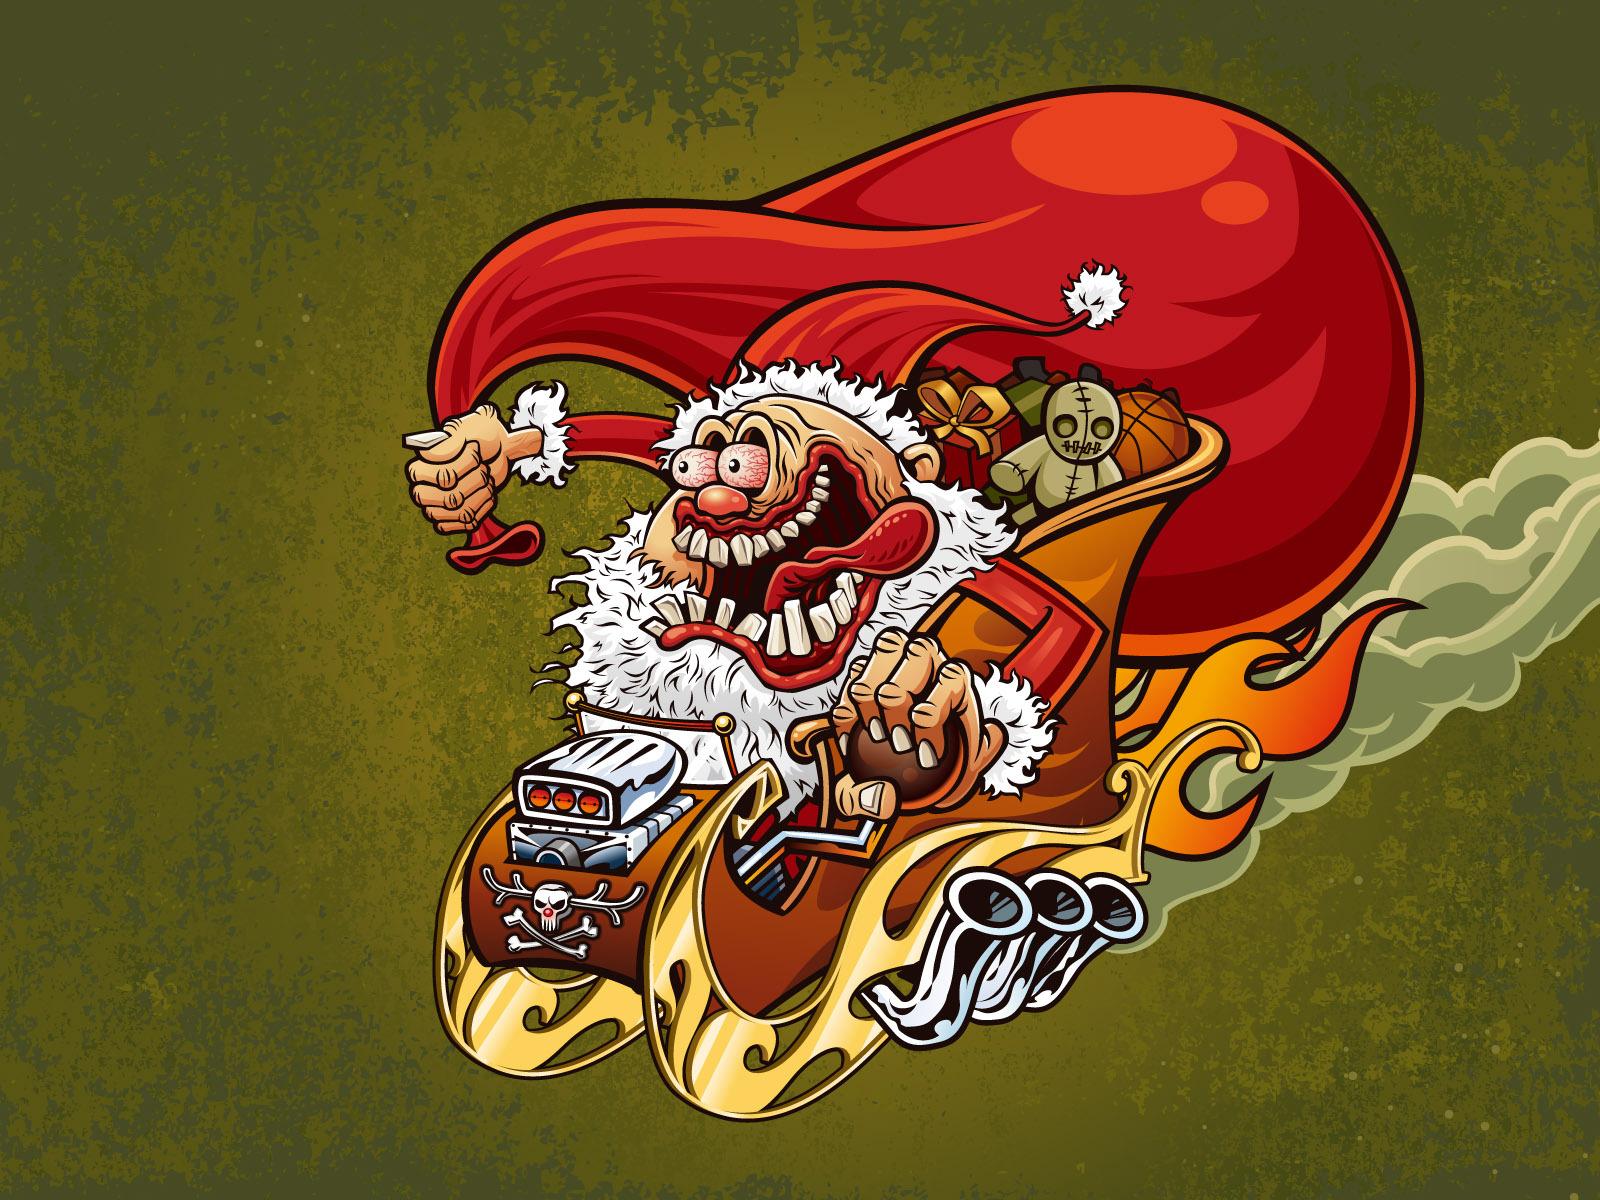 Дед мороз смешная картинка, открытка